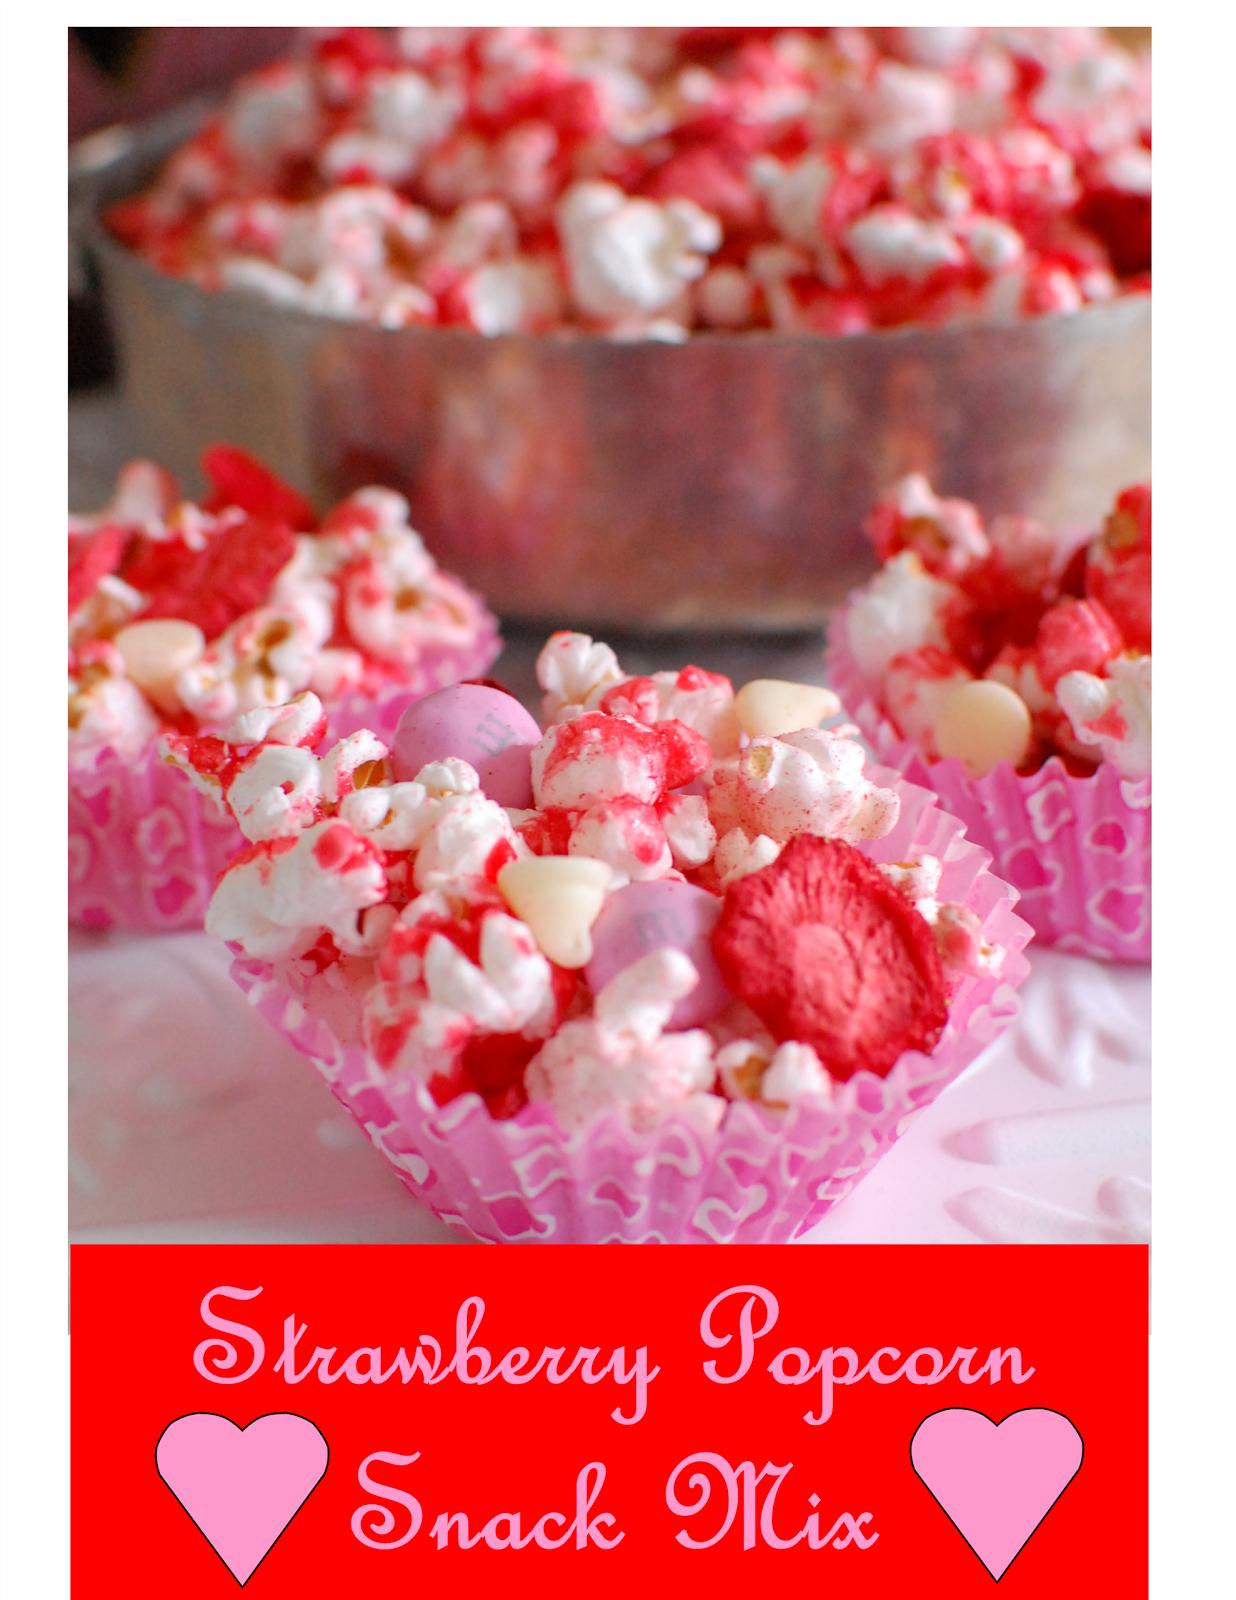 Strawberry Popcorn Snack Mix